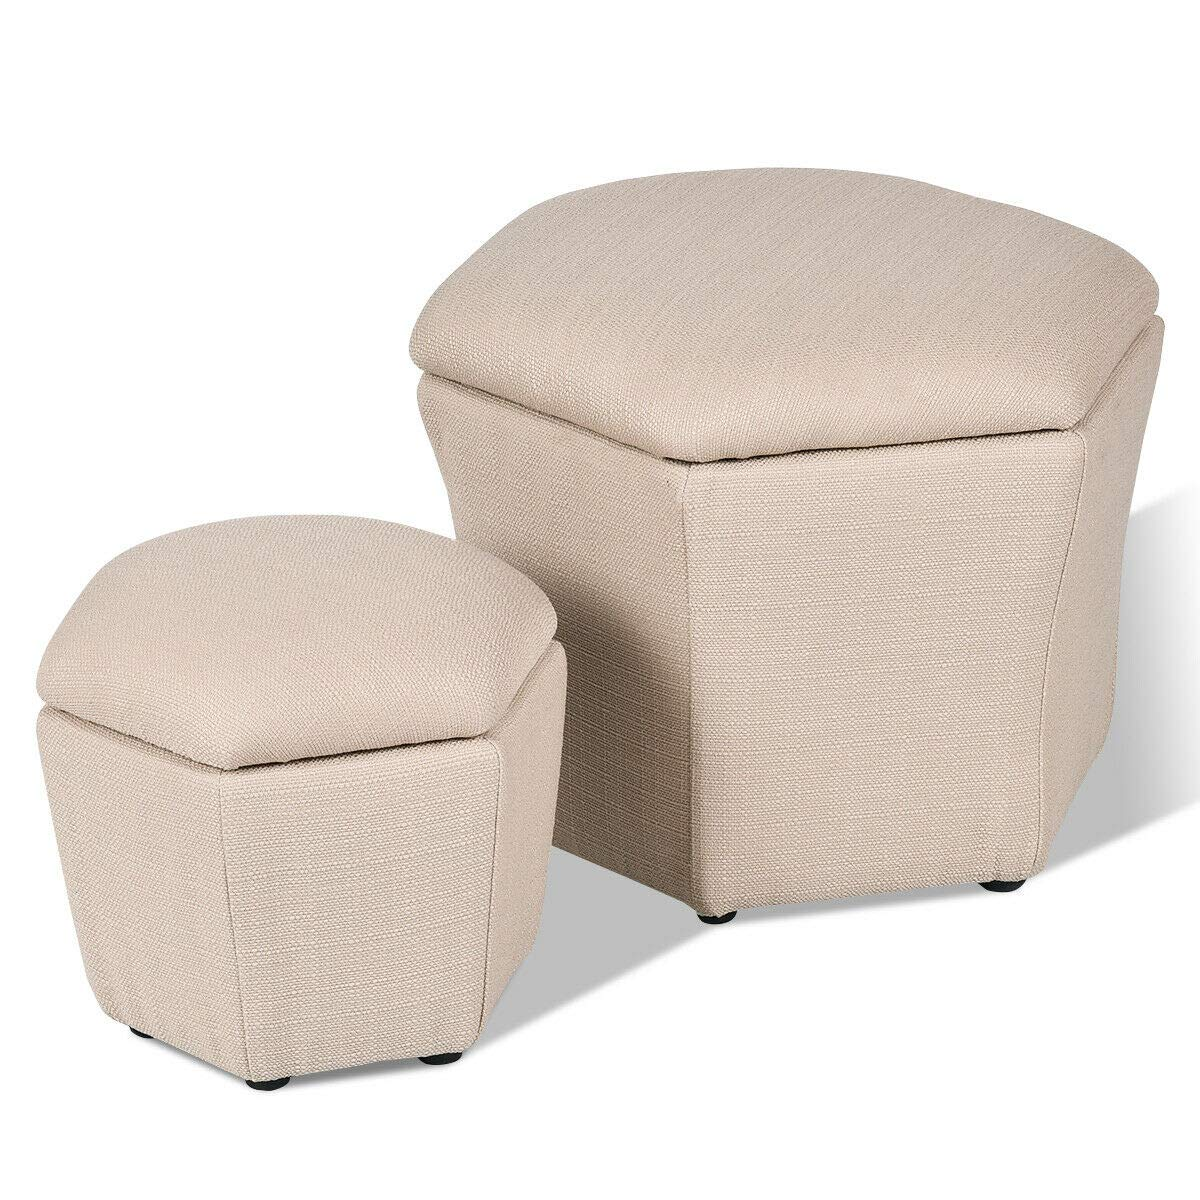 Giantex Set of 2 Storage Ottoman Box Foot Rest Stool Seat Bench Organizer